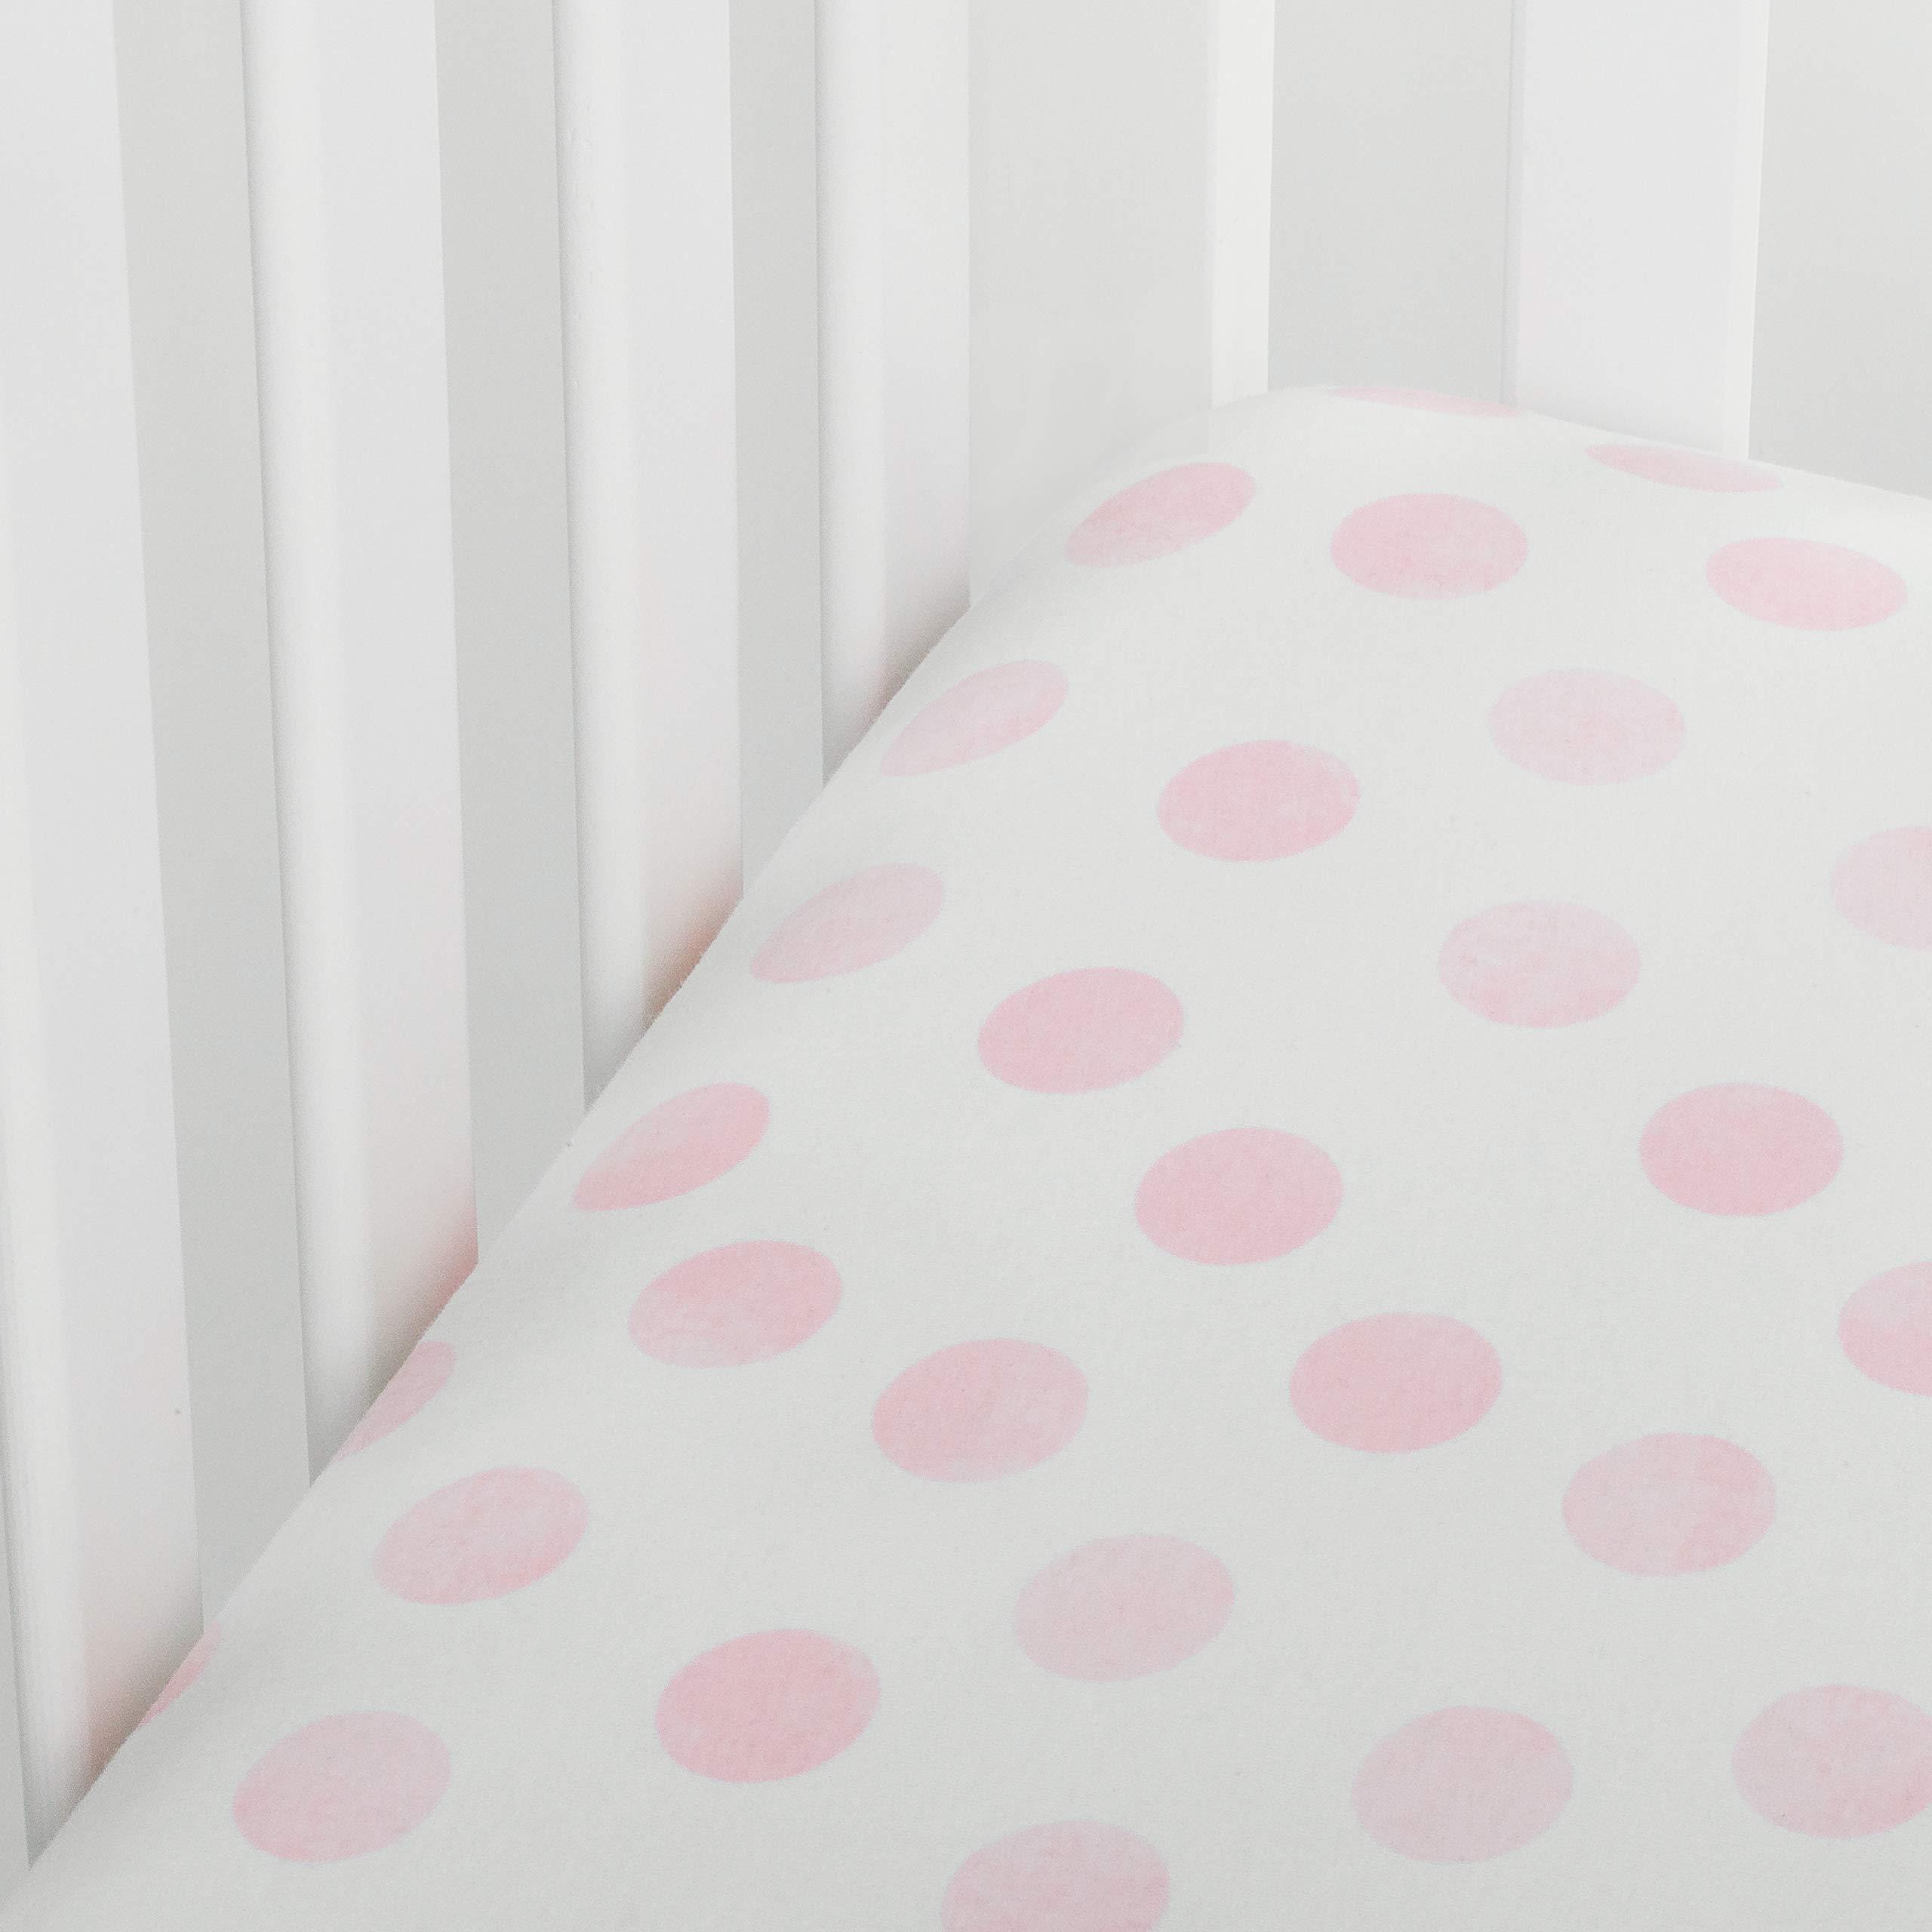 Andi Mae Crib Sheet - Watercolor Pink Dots - 100% Jersey Cotton - Fits Standard Crib or Toddler Mattresses